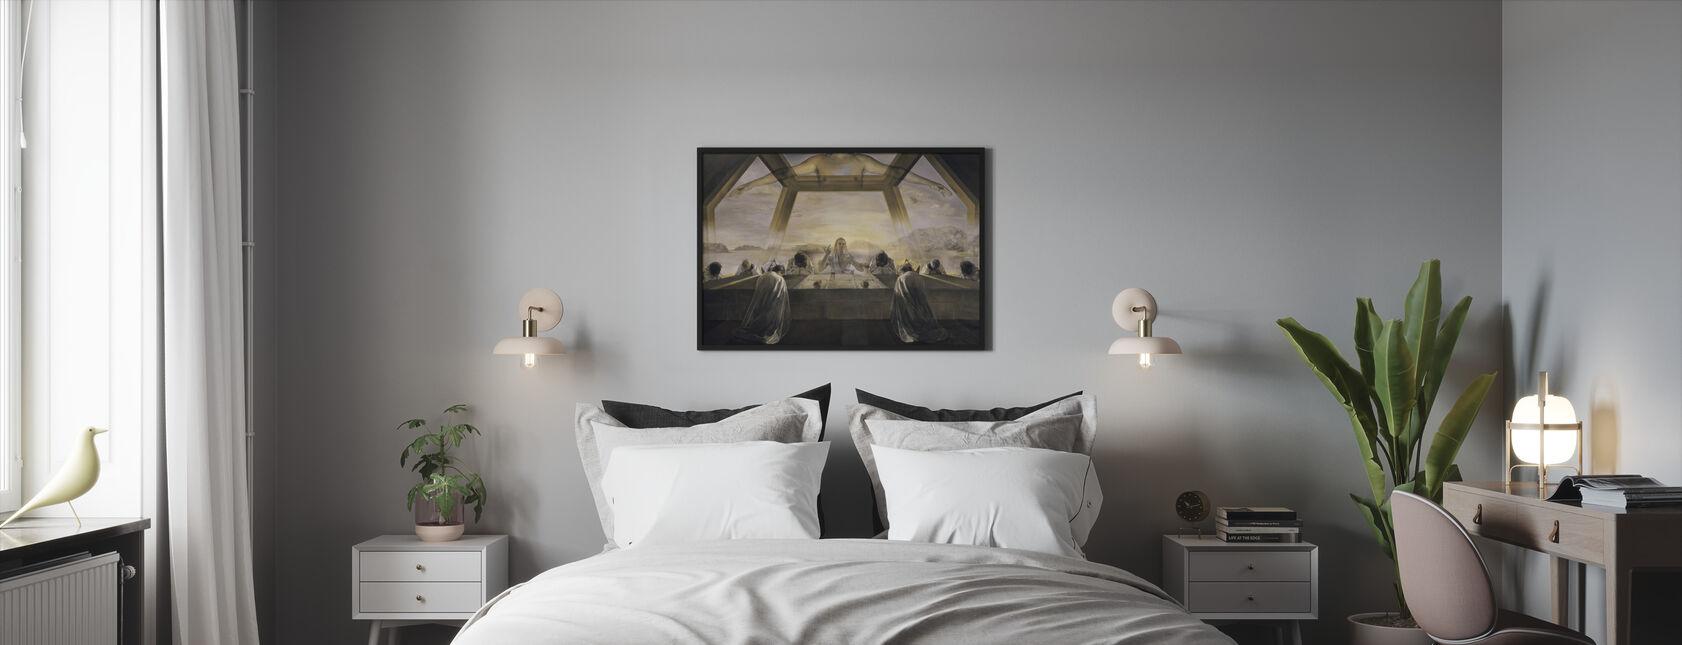 Abendmahl - Salvador Dali - Gerahmtes bild - Schlafzimmer